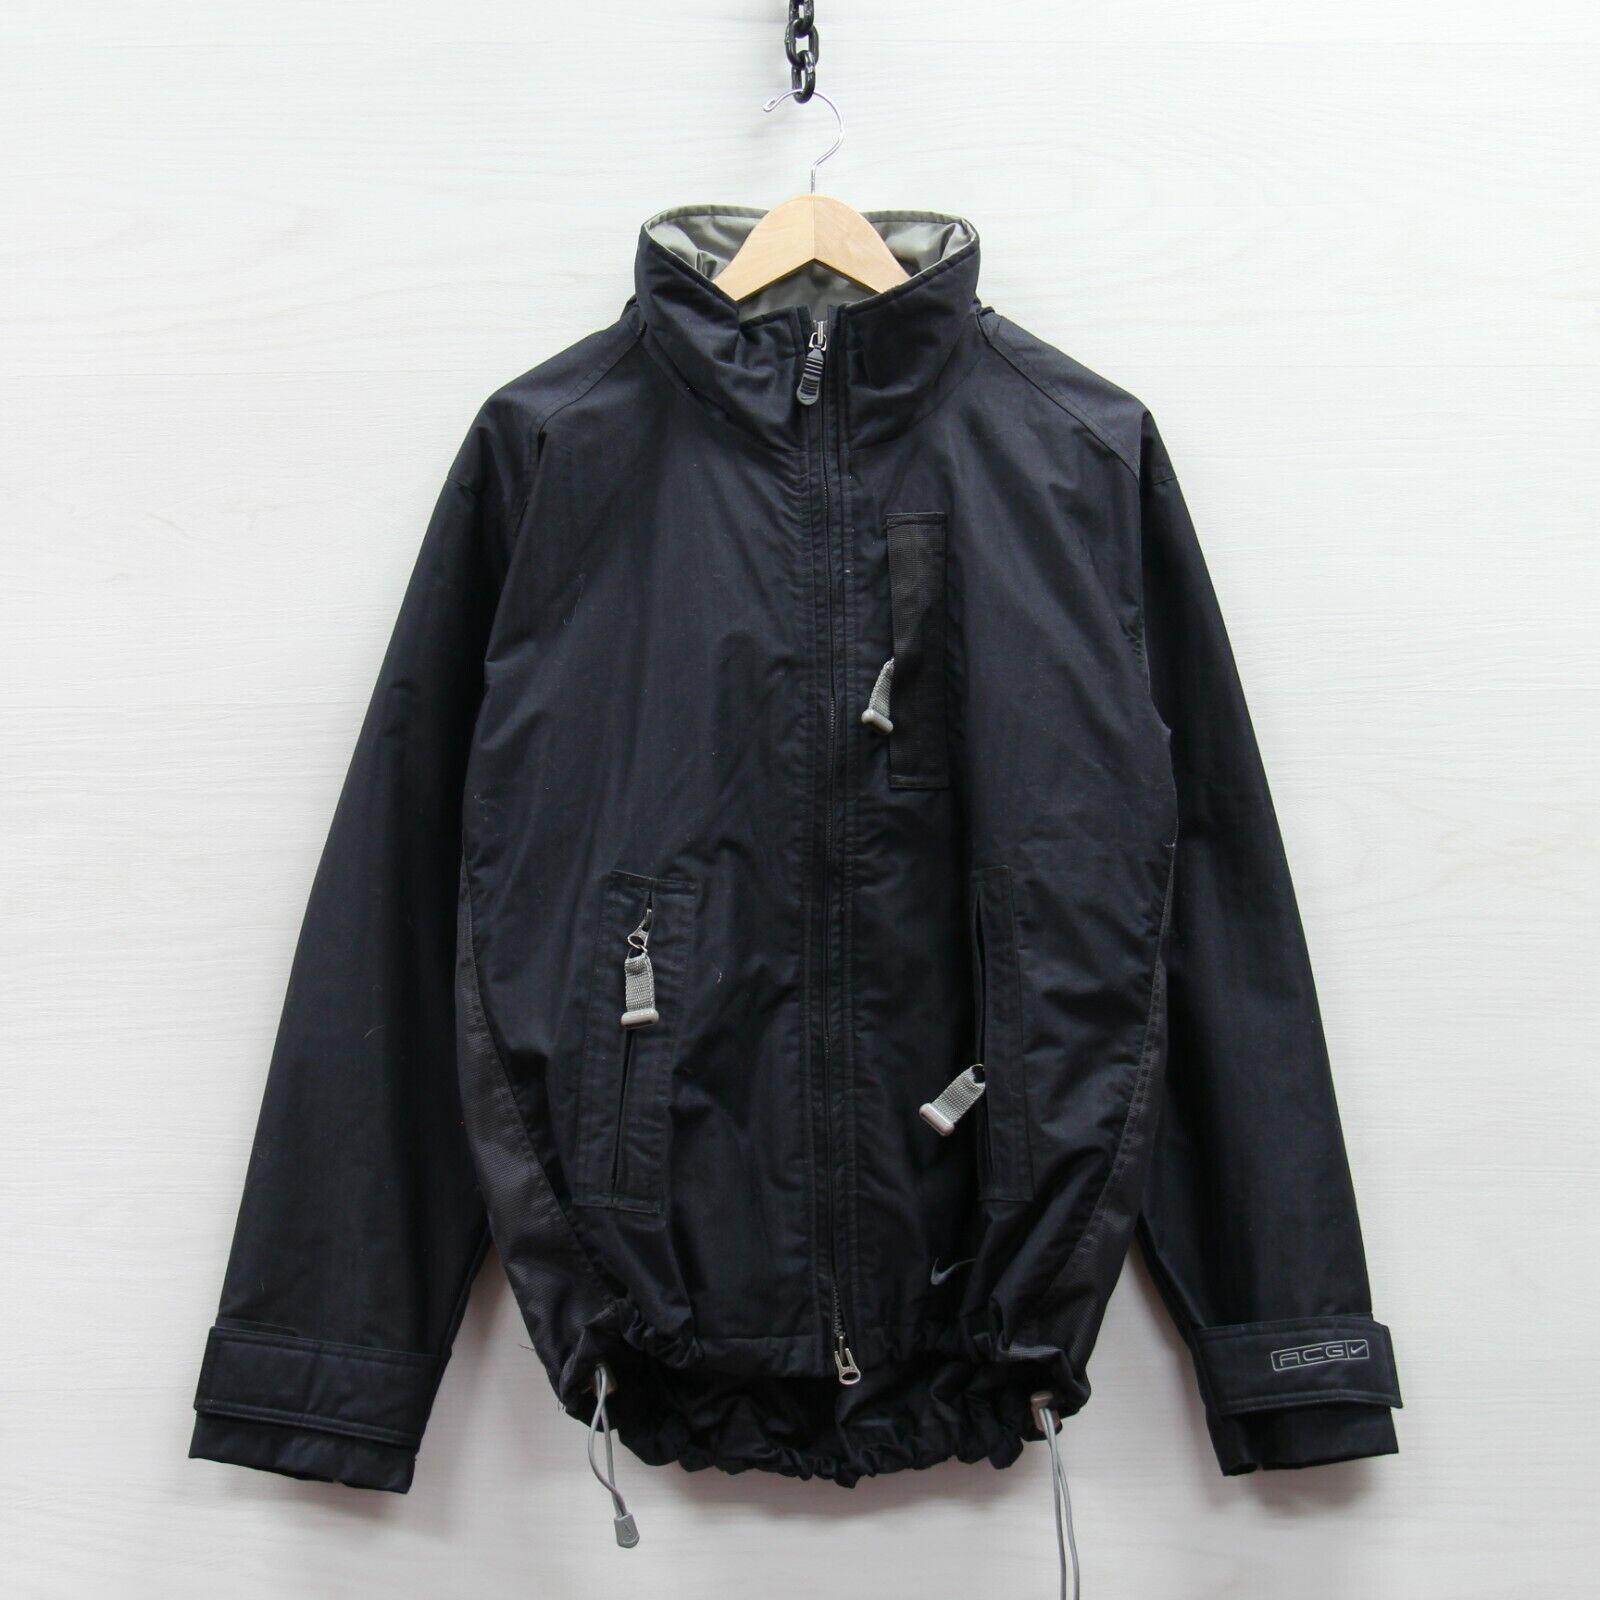 Vintage Nike ACG Light Ski Jacket Womens Large Black All Conditions Gear Swoosh